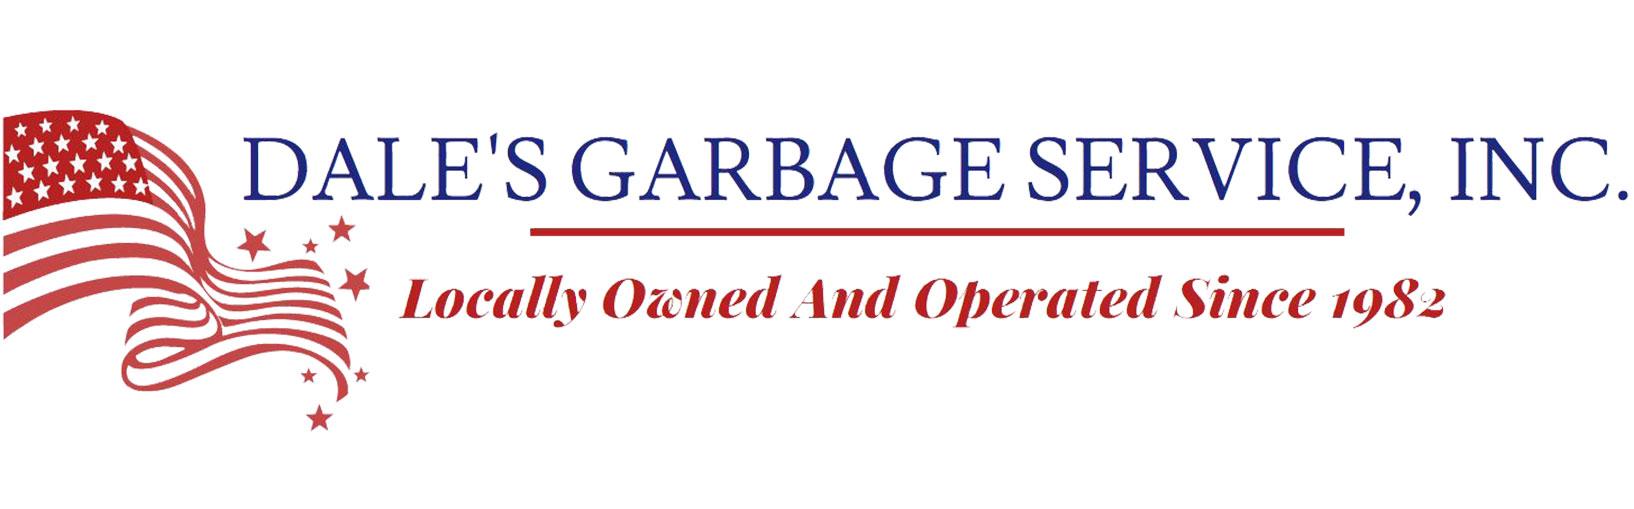 Dale's Garbage Service